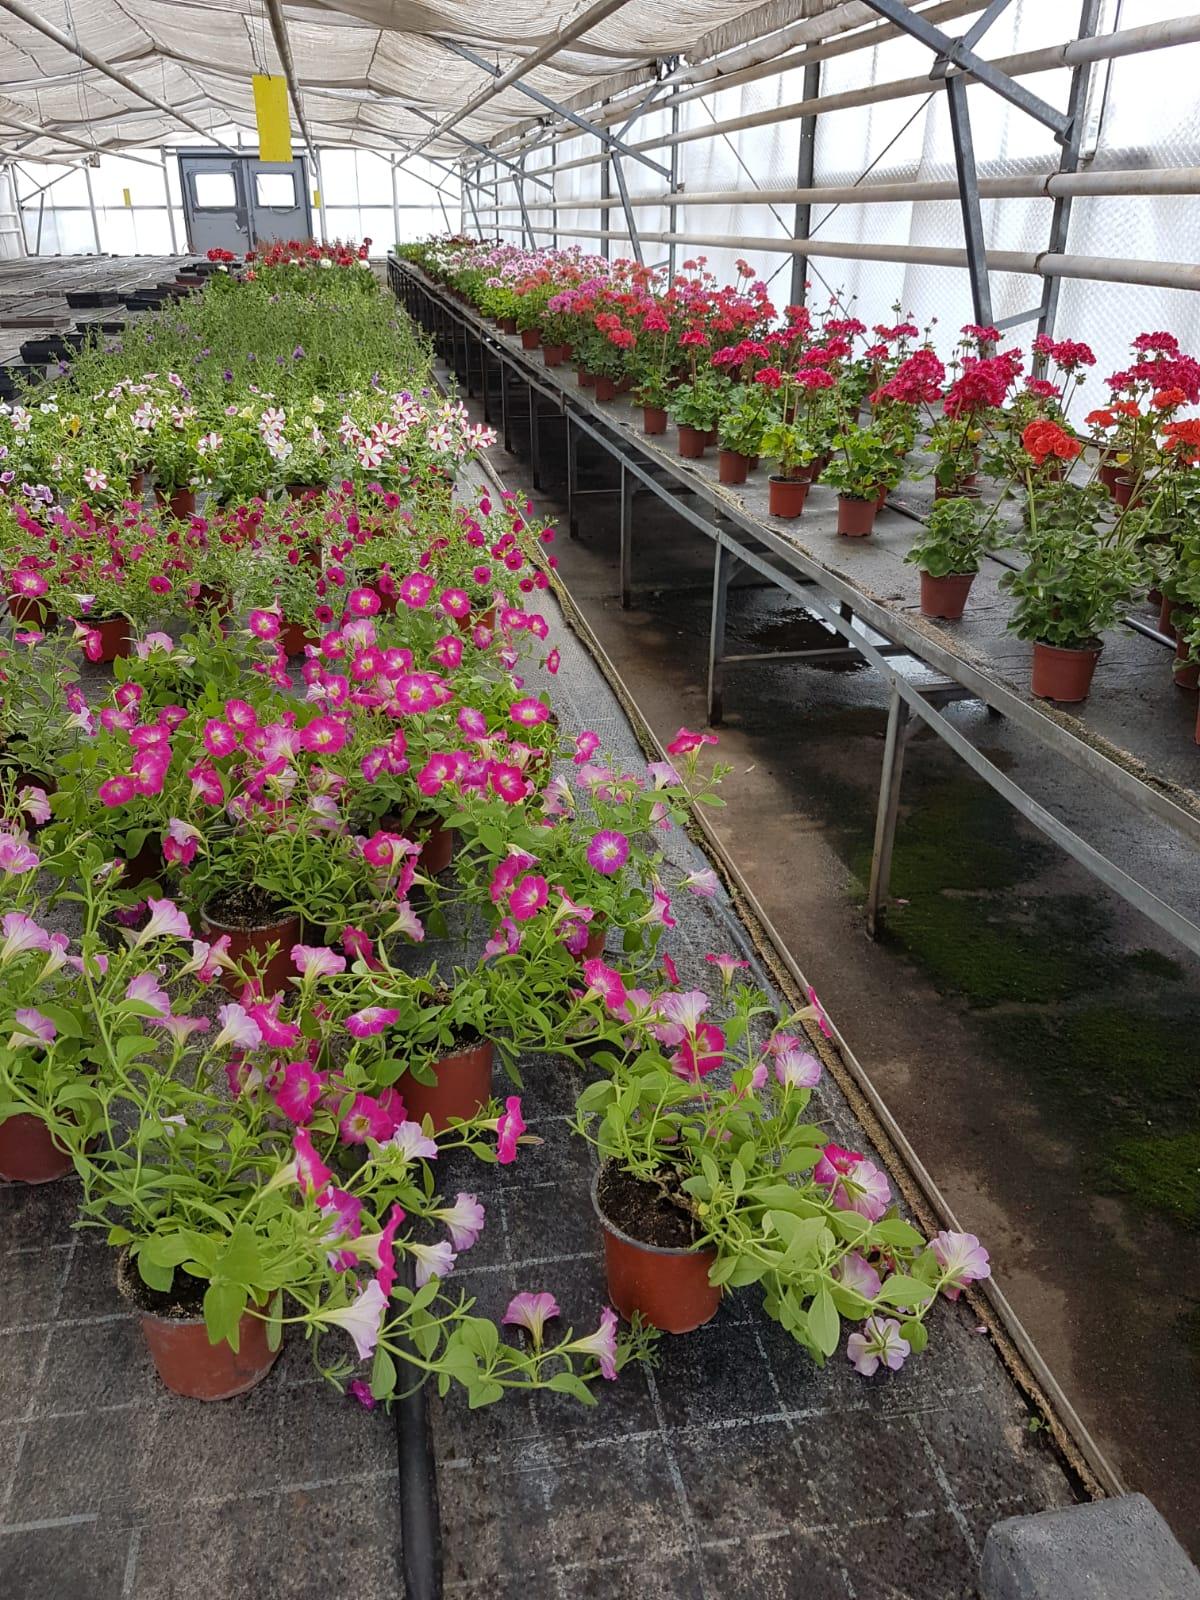 Sommerblumen, großes Angebot!